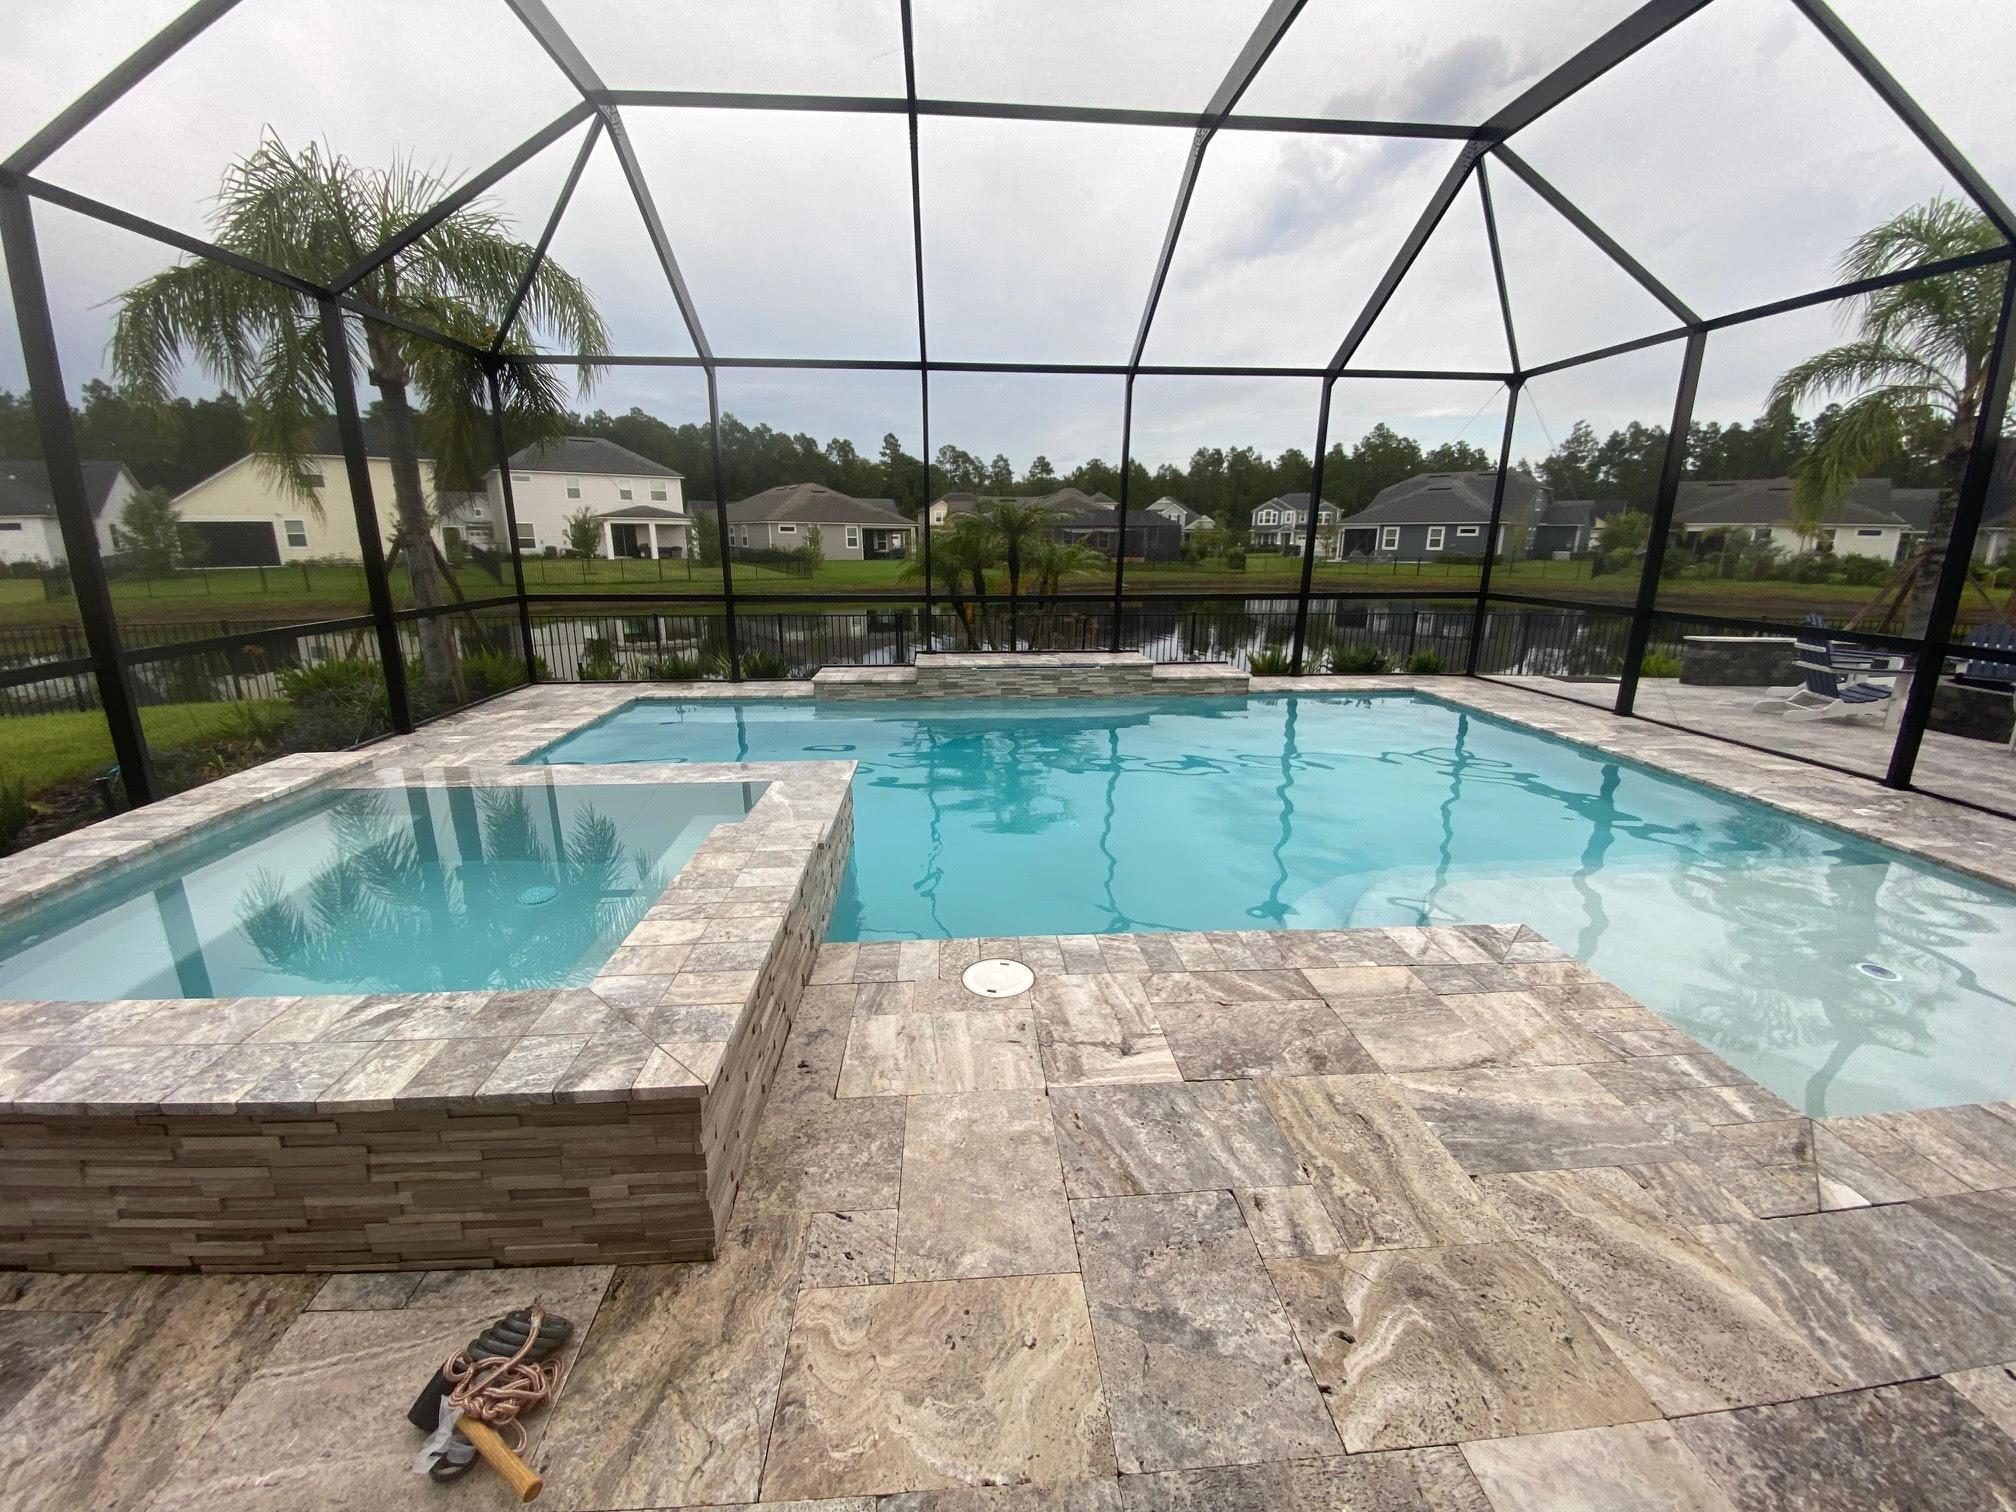 marble tile screen enclosure pool/spa